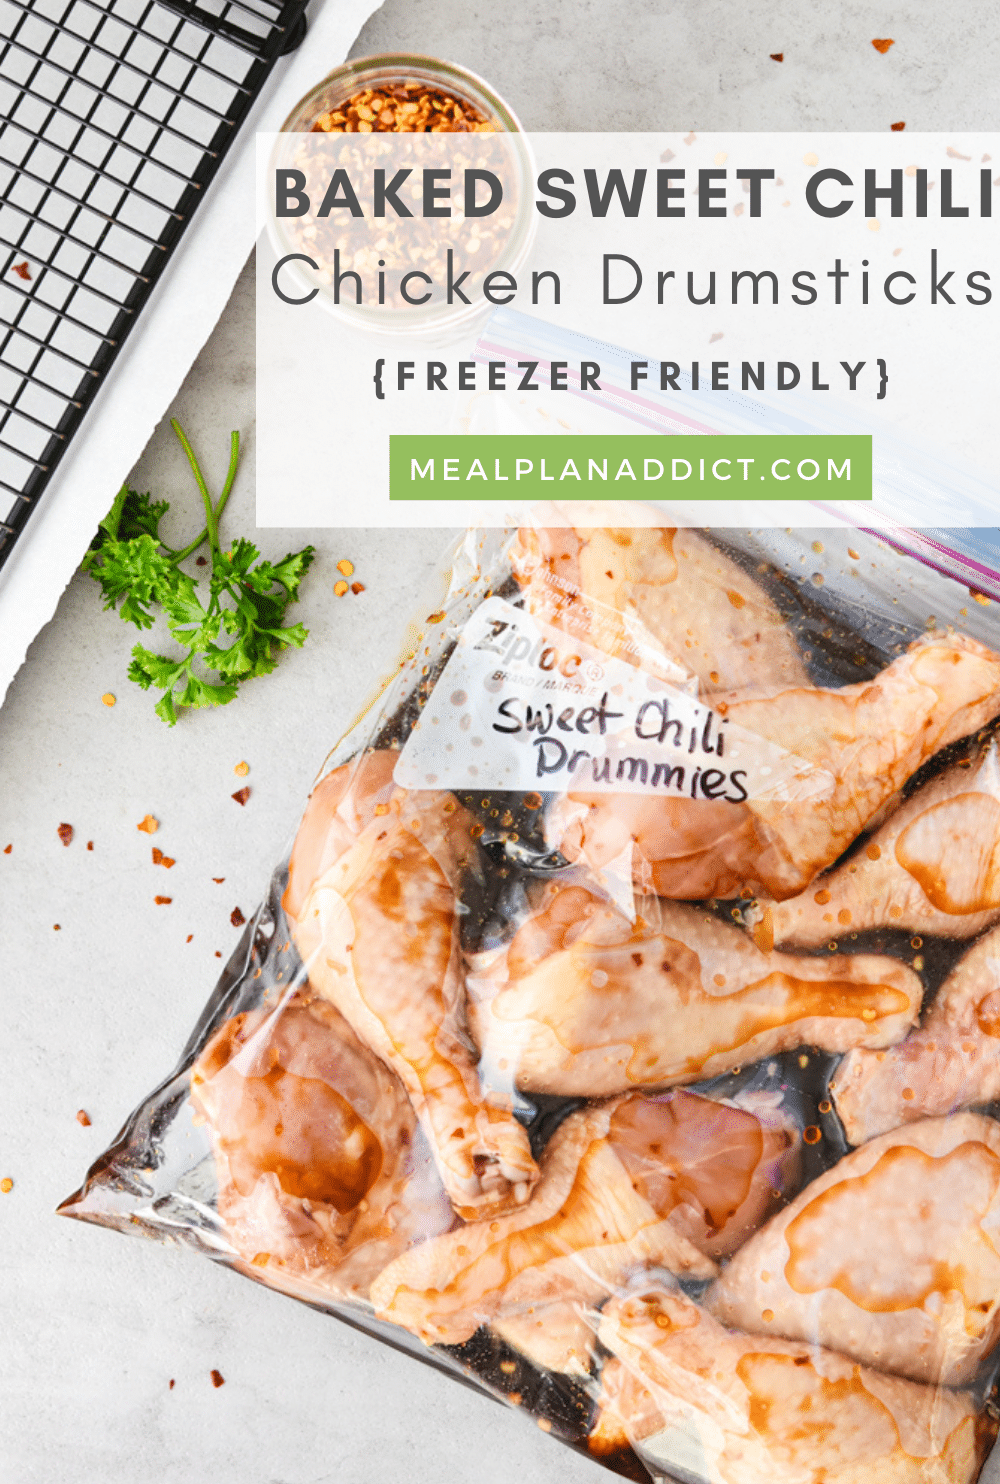 Freezer Friendly Baked Sweet Chili Chicken Drumsticks | Meal Plan Addict